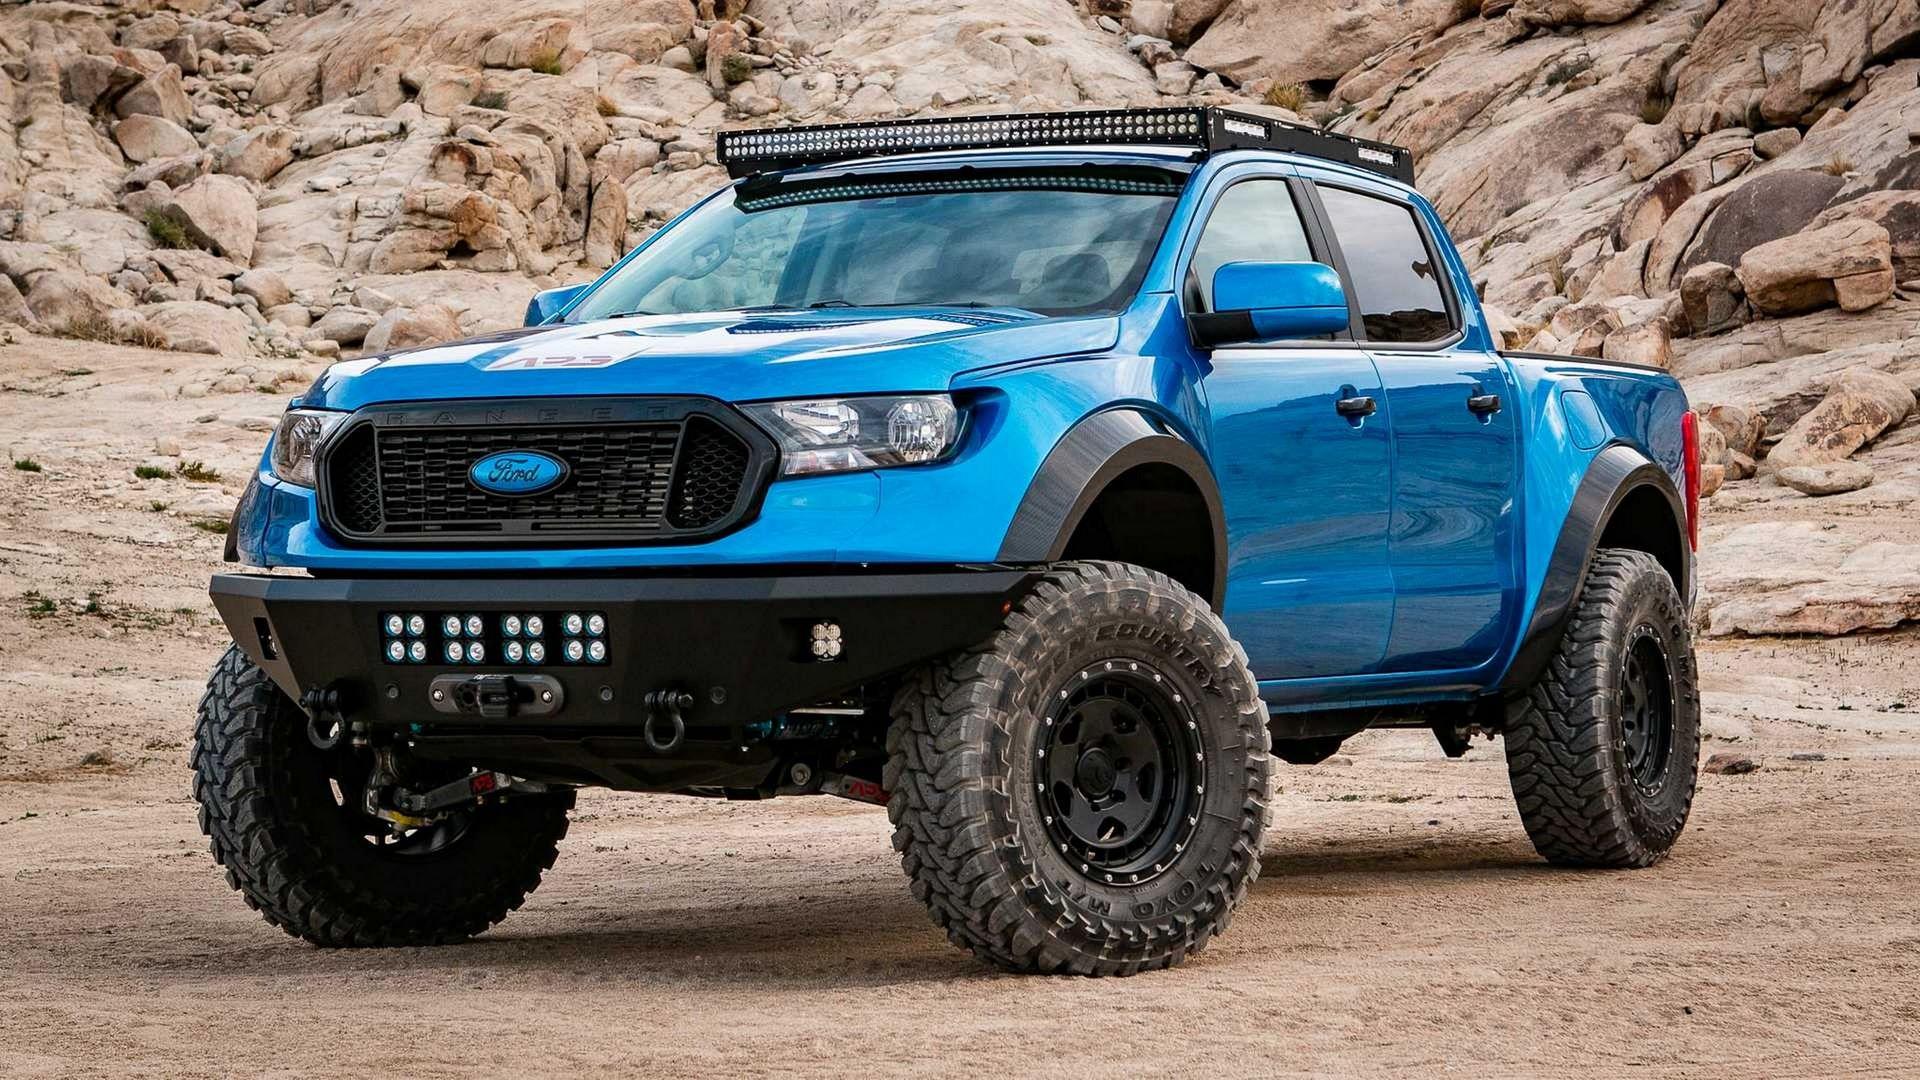 Ford-Ranger-Prorunner-By-APG-2